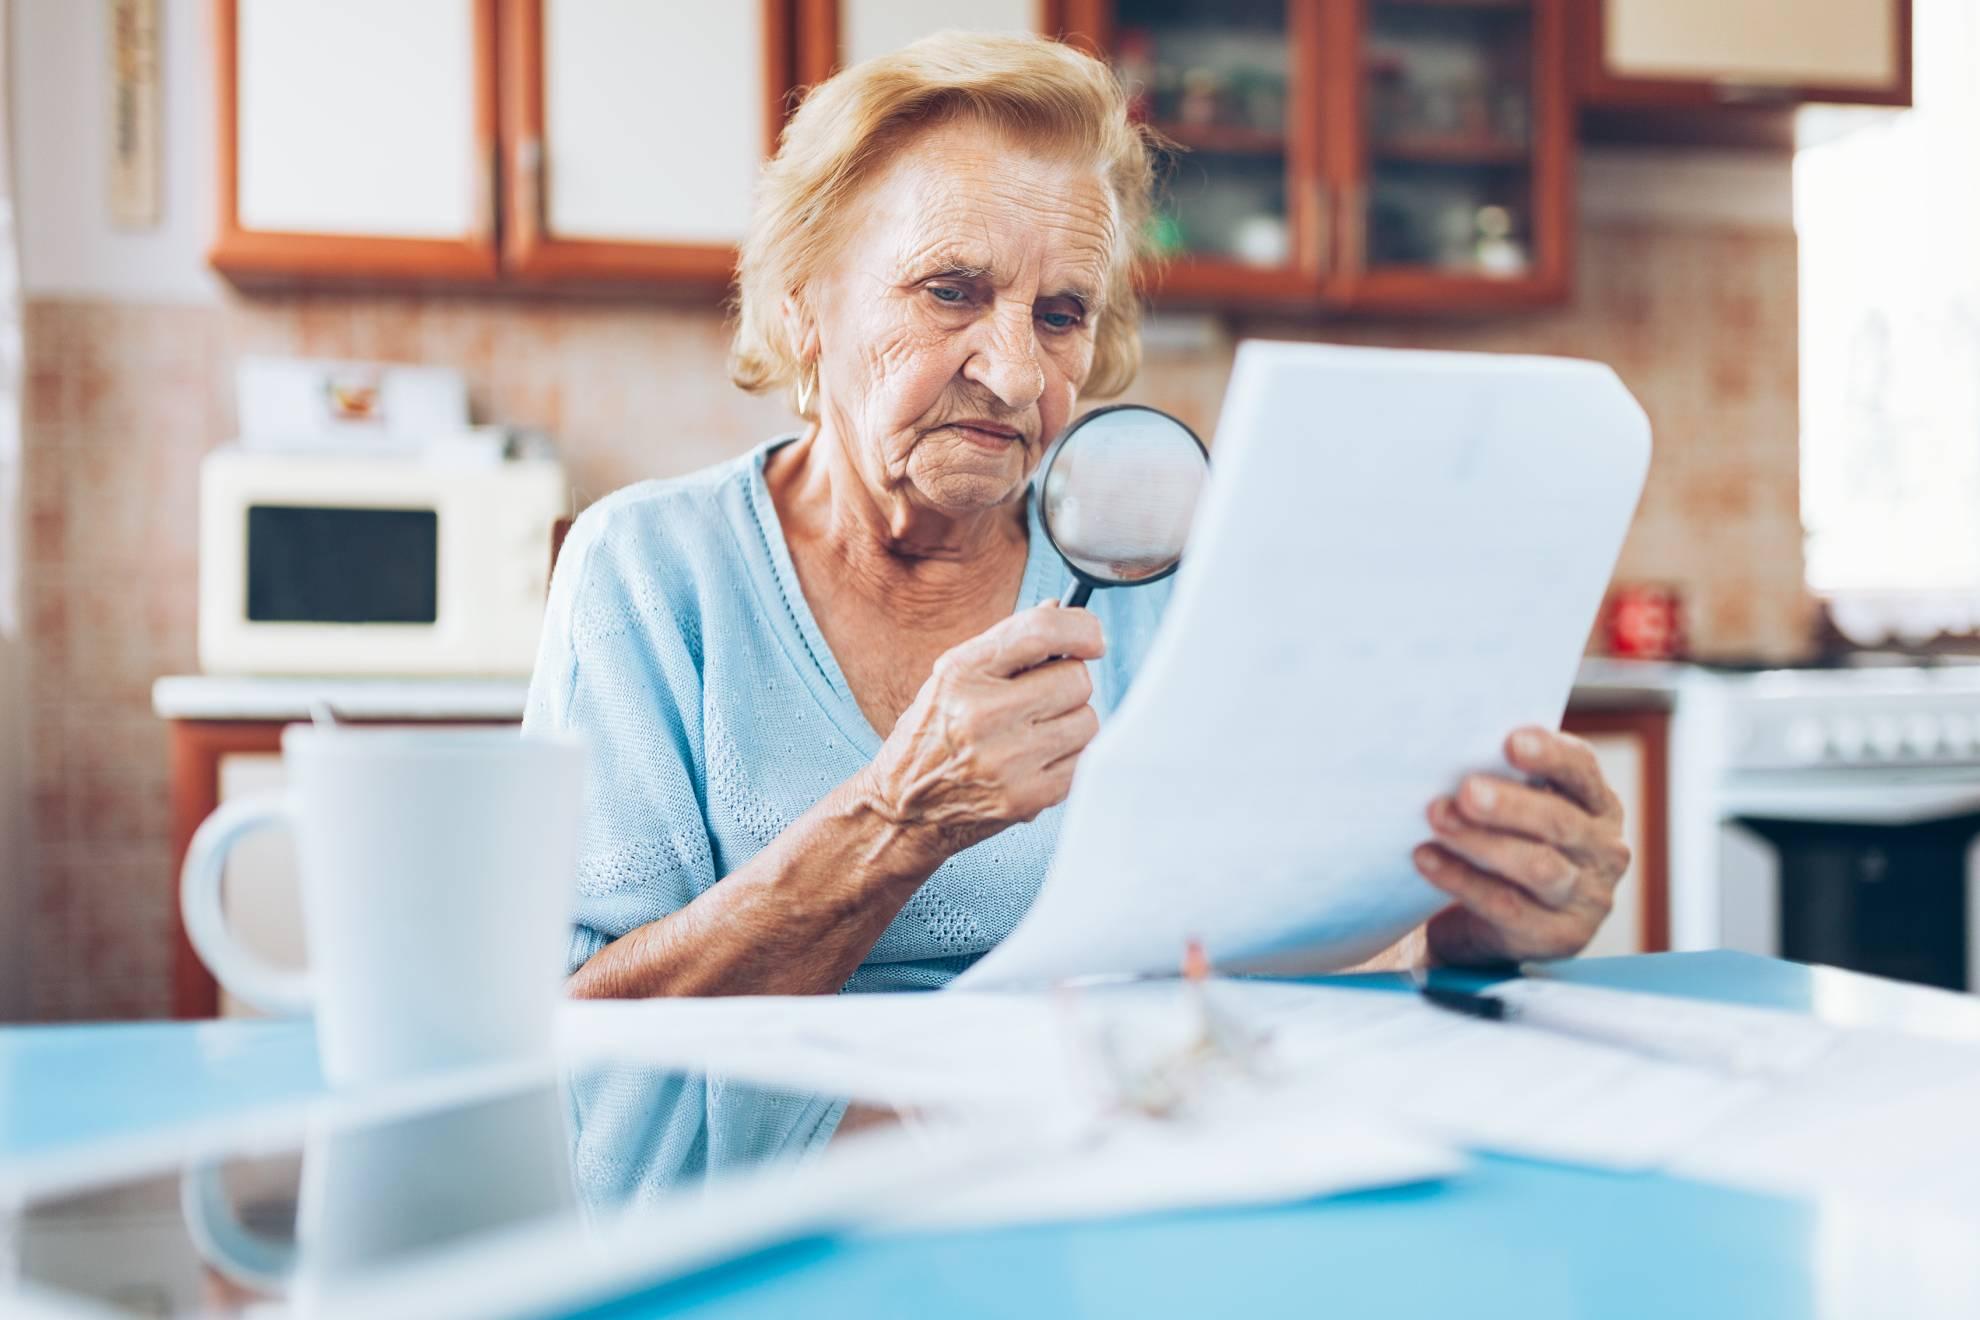 elderly-woman-looking-at-her-utility-bills-67AYR2L (1)